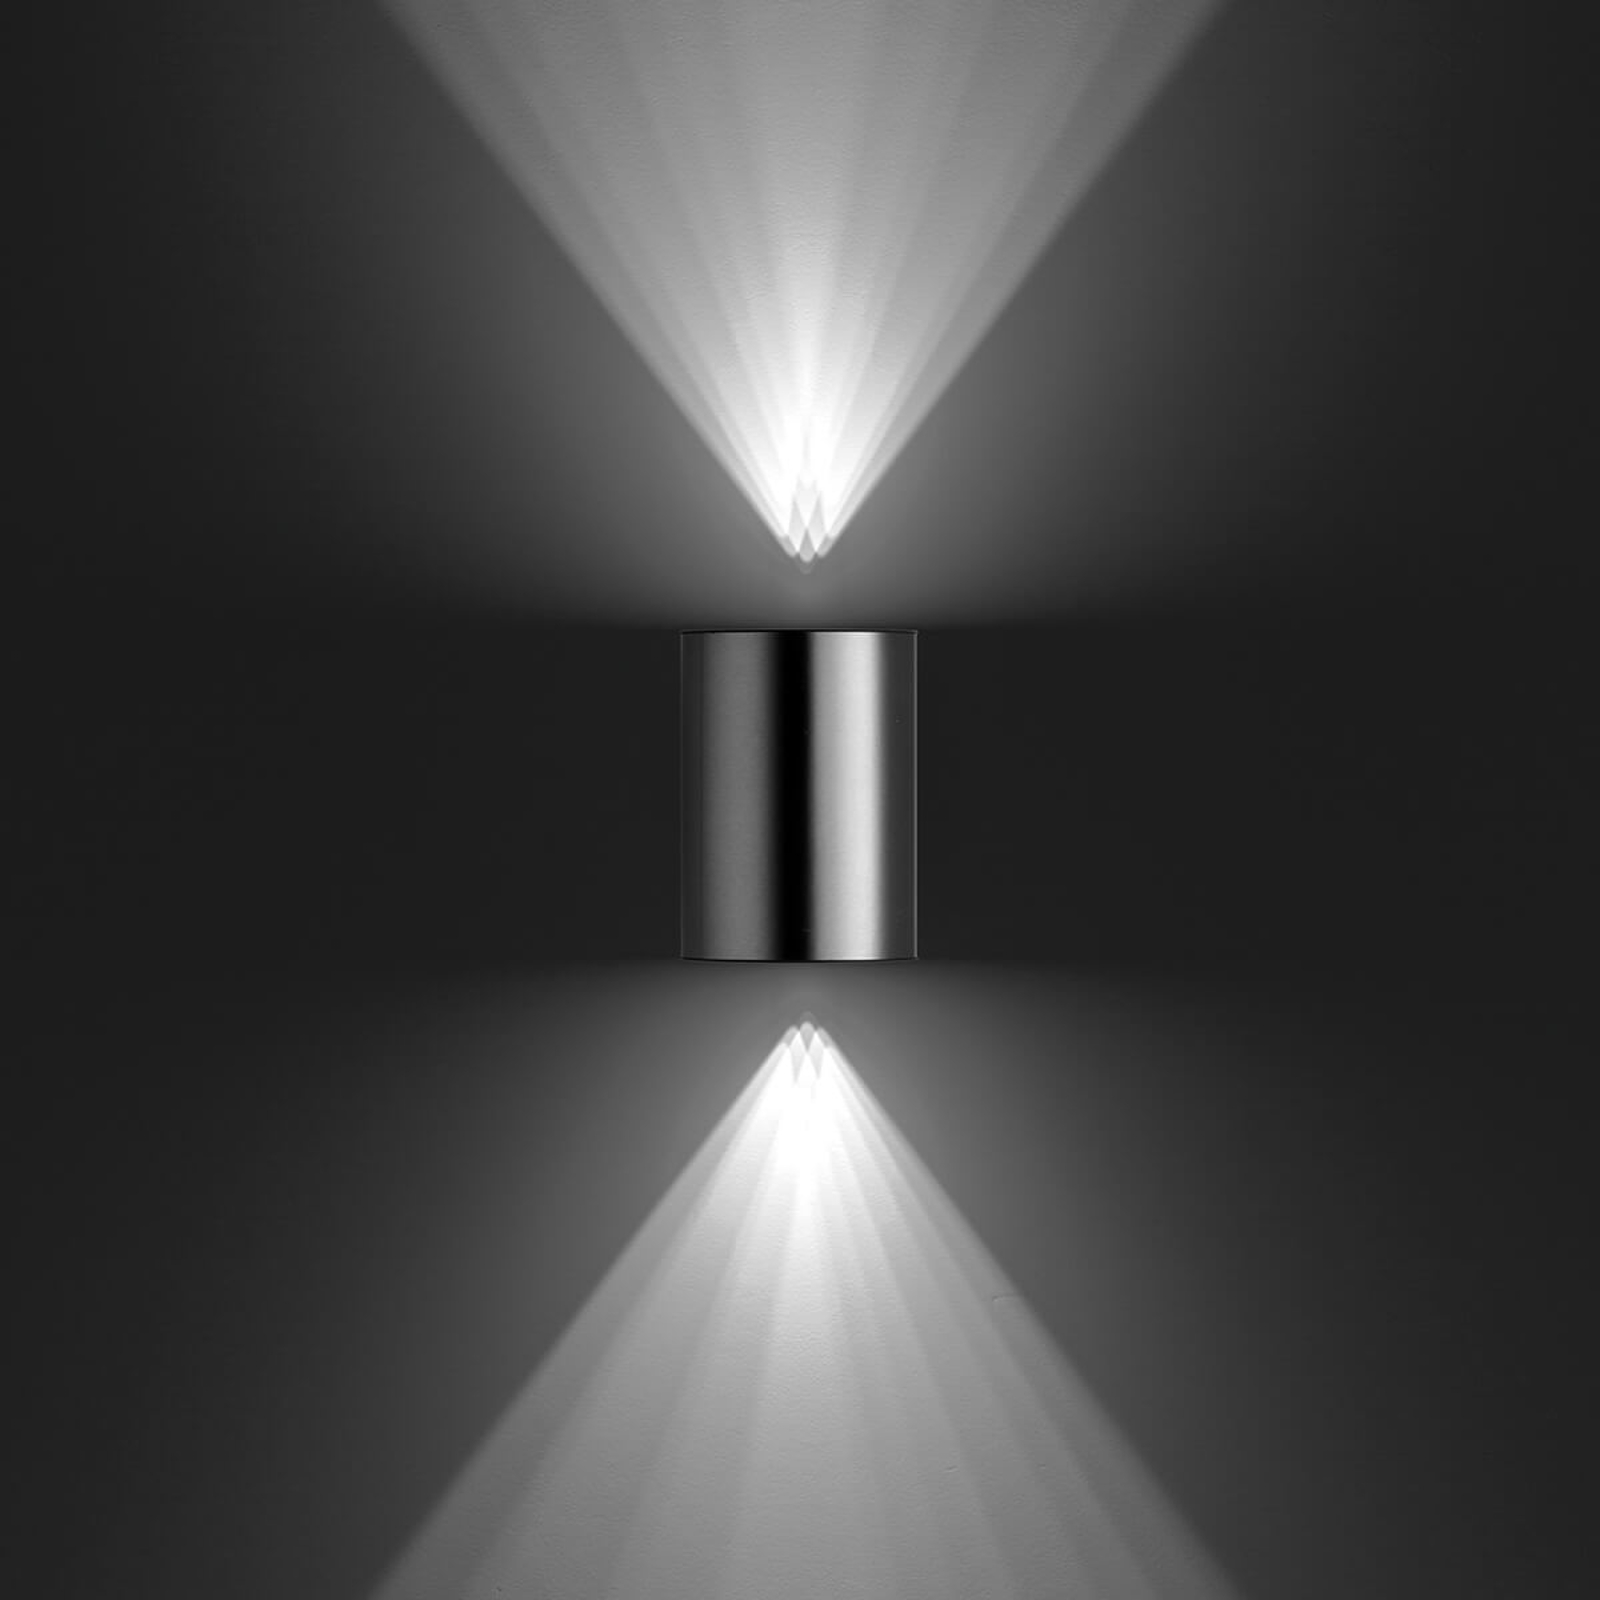 Philips Buxus - LED-Außenwandlampe aus Edelstahl